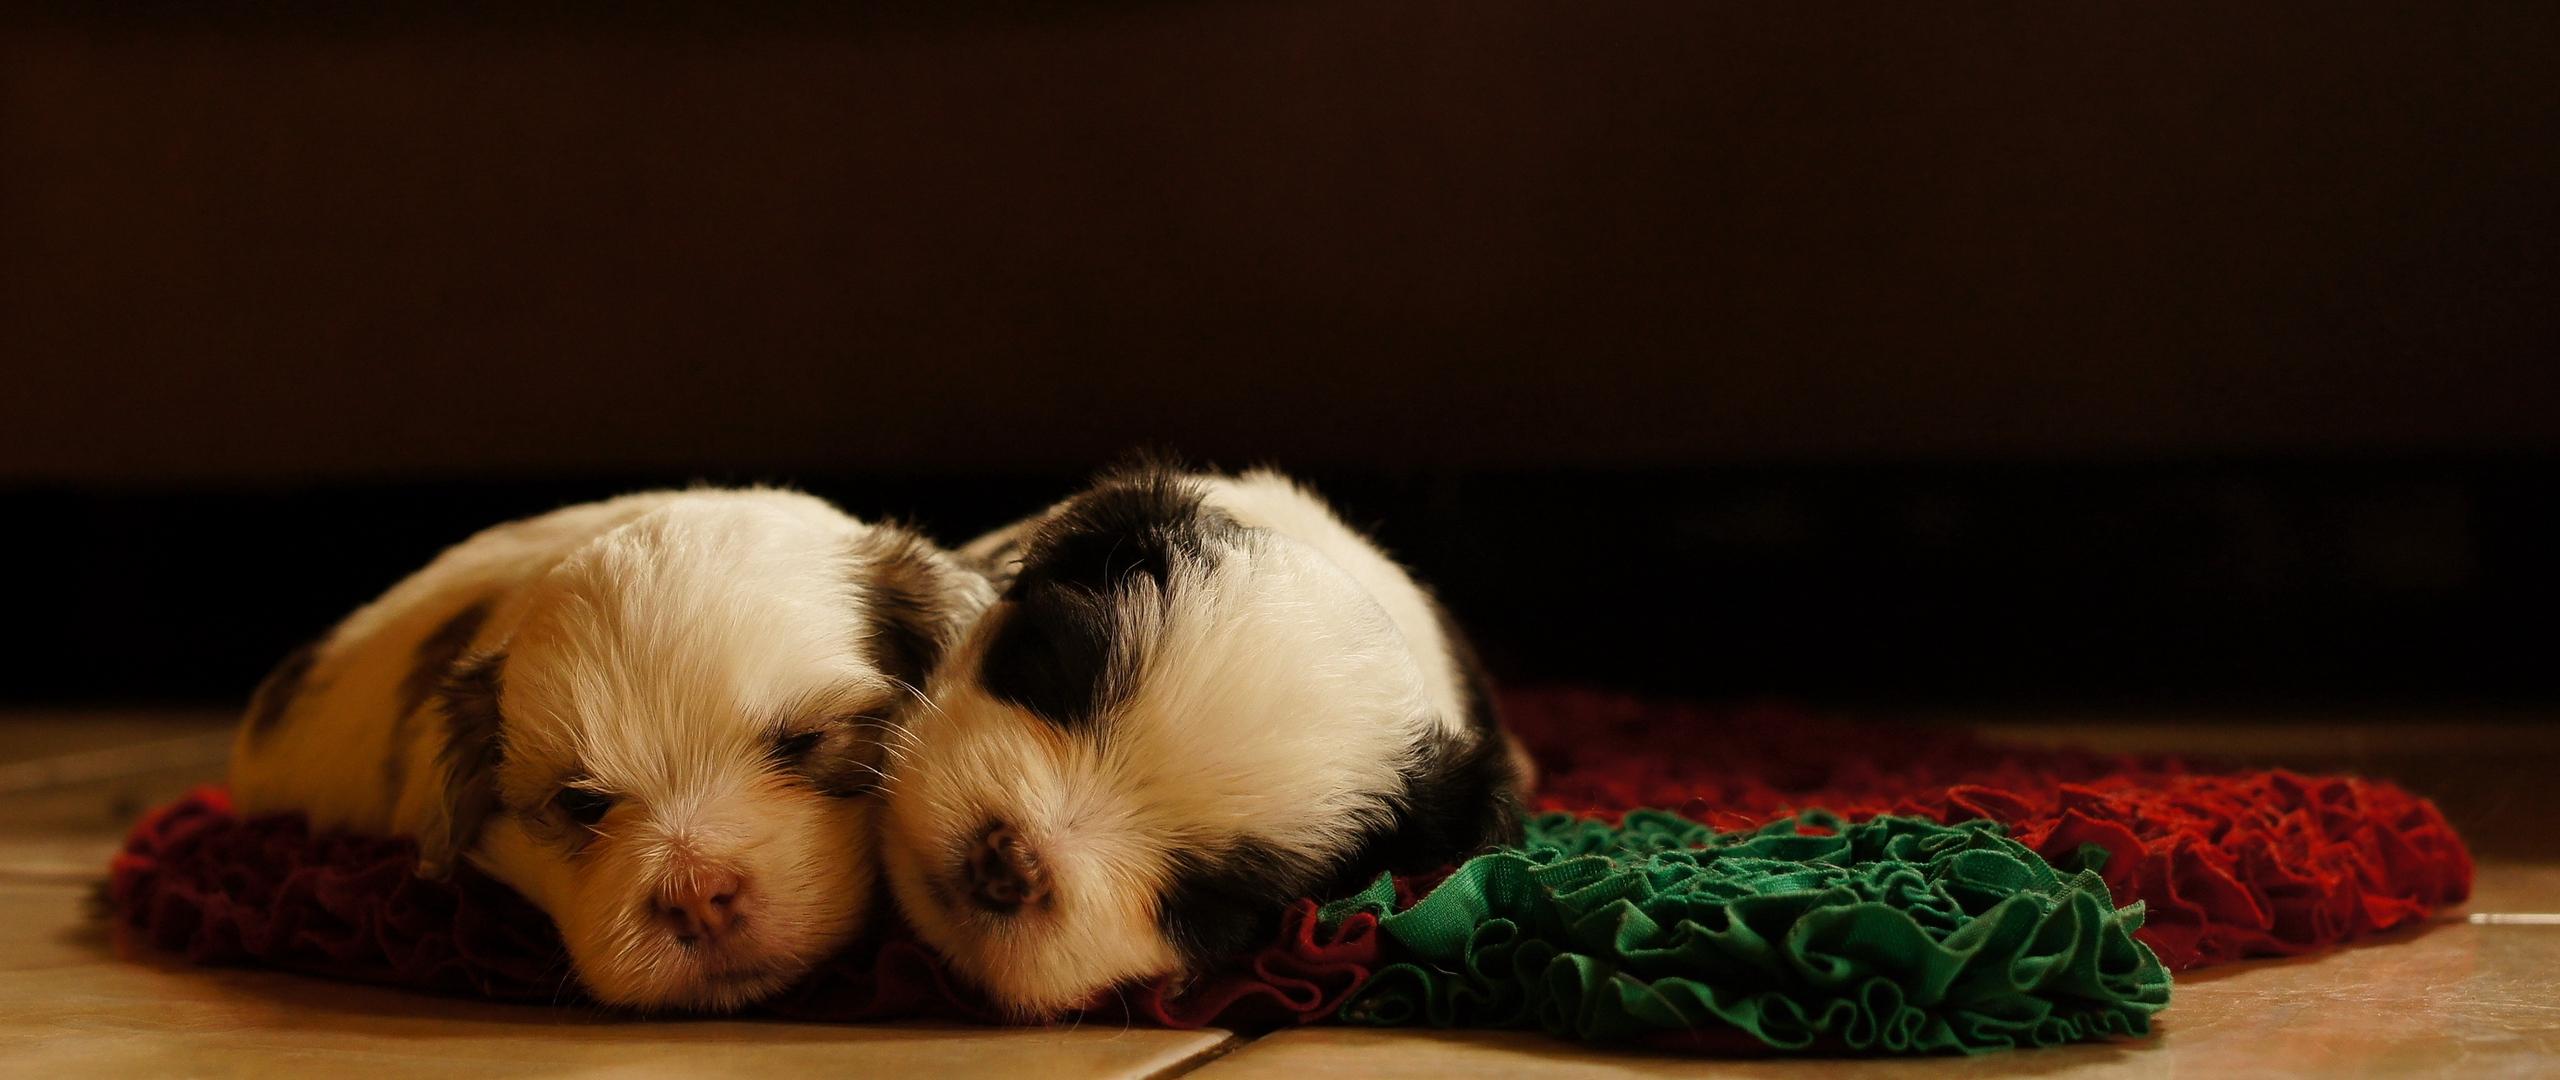 Download wallpaper 2560x1080 dogs puppies sleeping lying 2560x1080